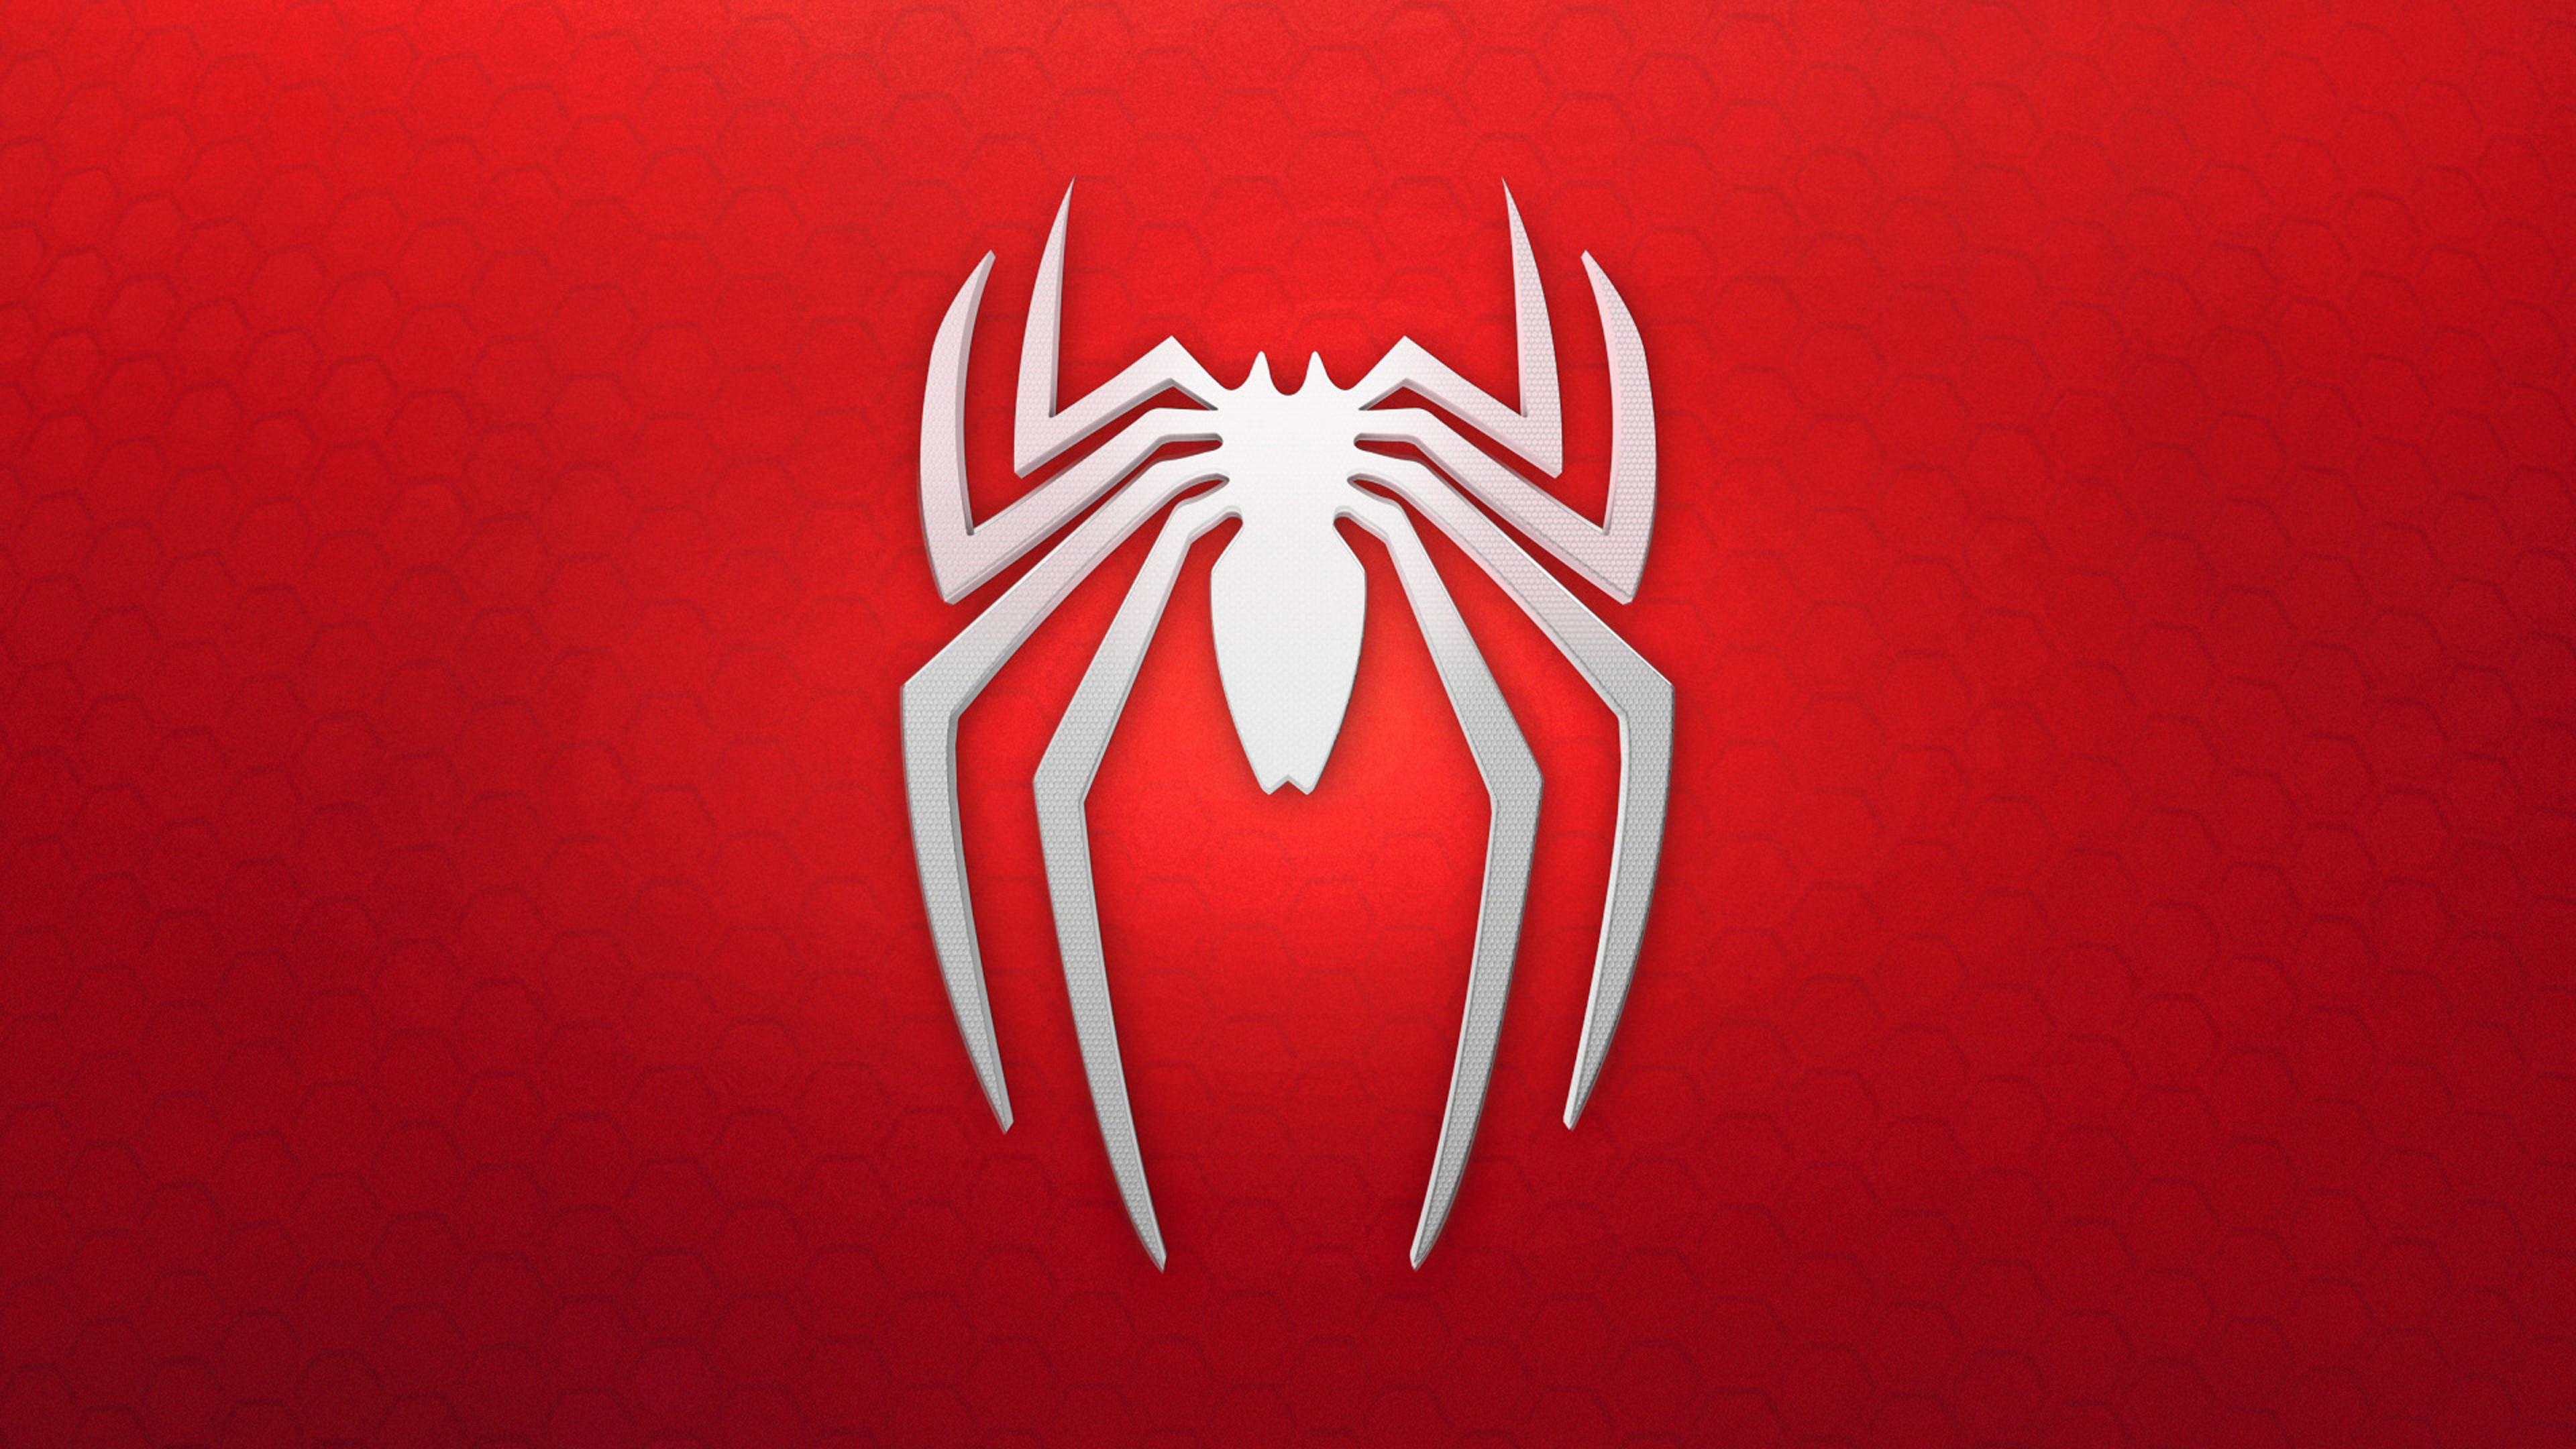 3840x2160 Spiderman 4k Logo Background Download Amazing